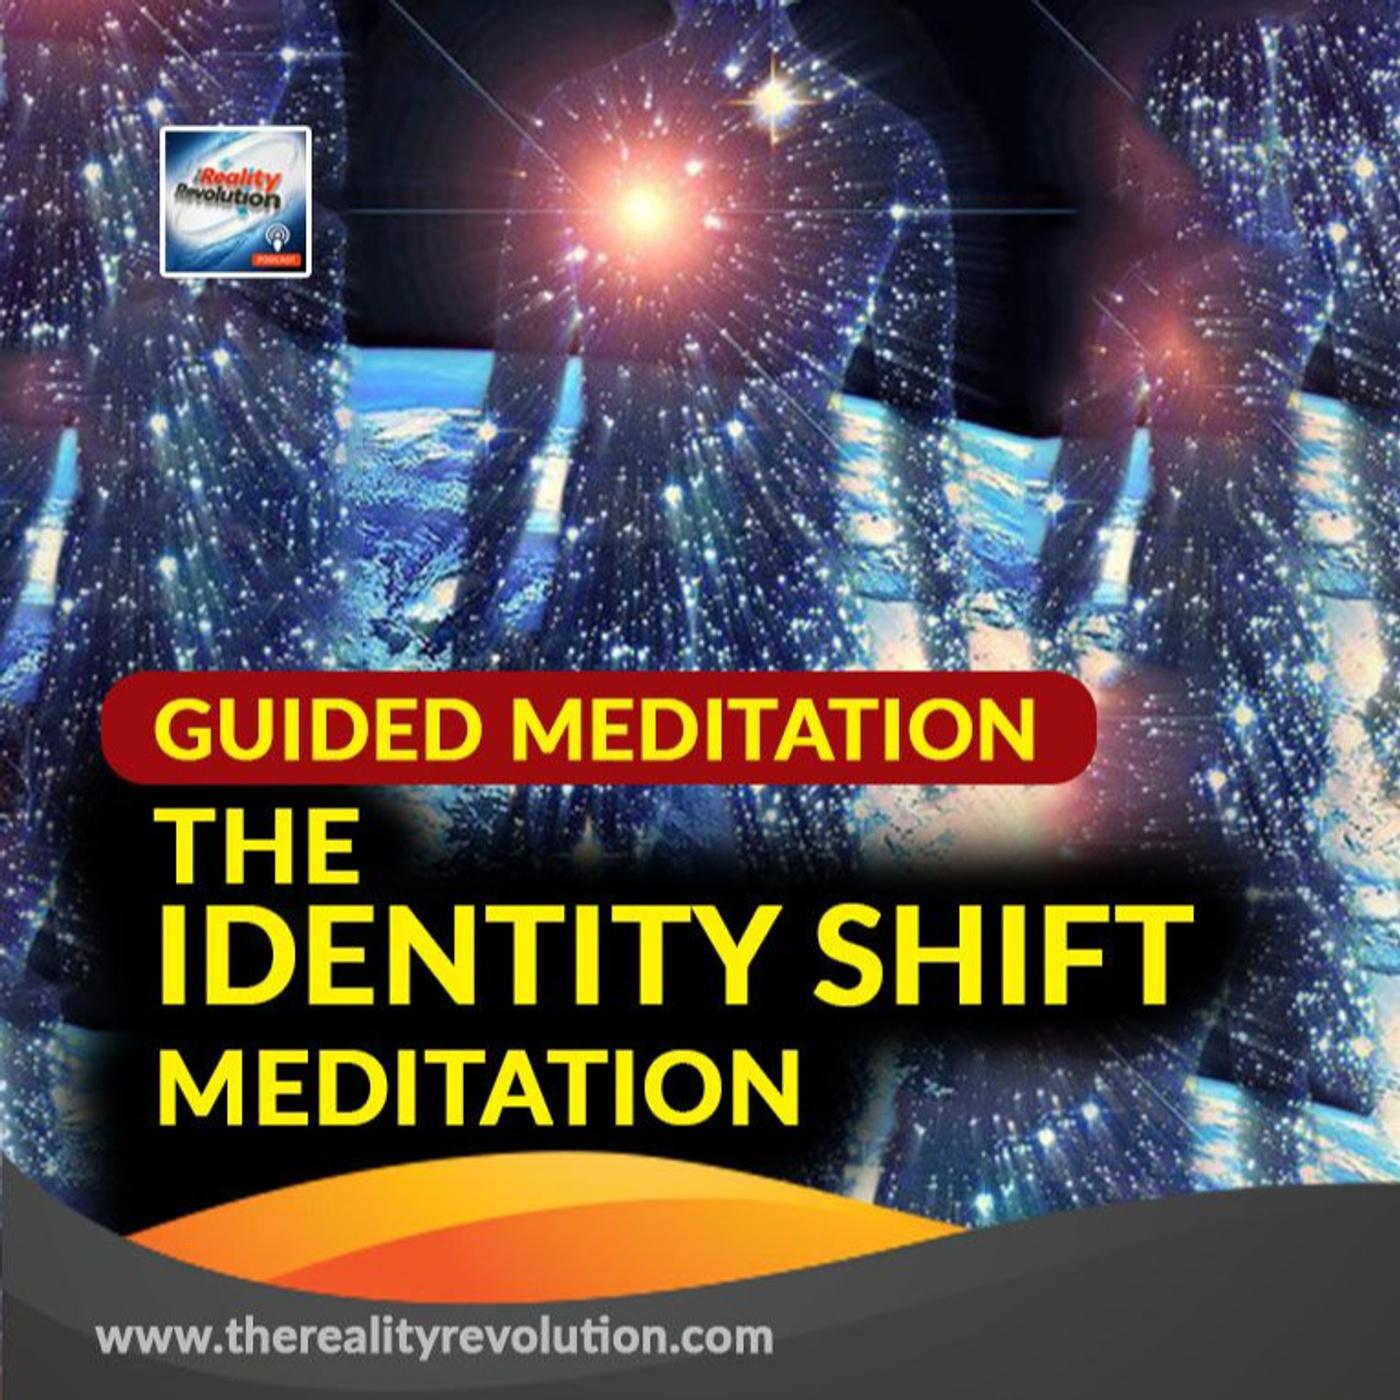 84 Guided Meditation: The Identity Shift Meditation (111 HZ